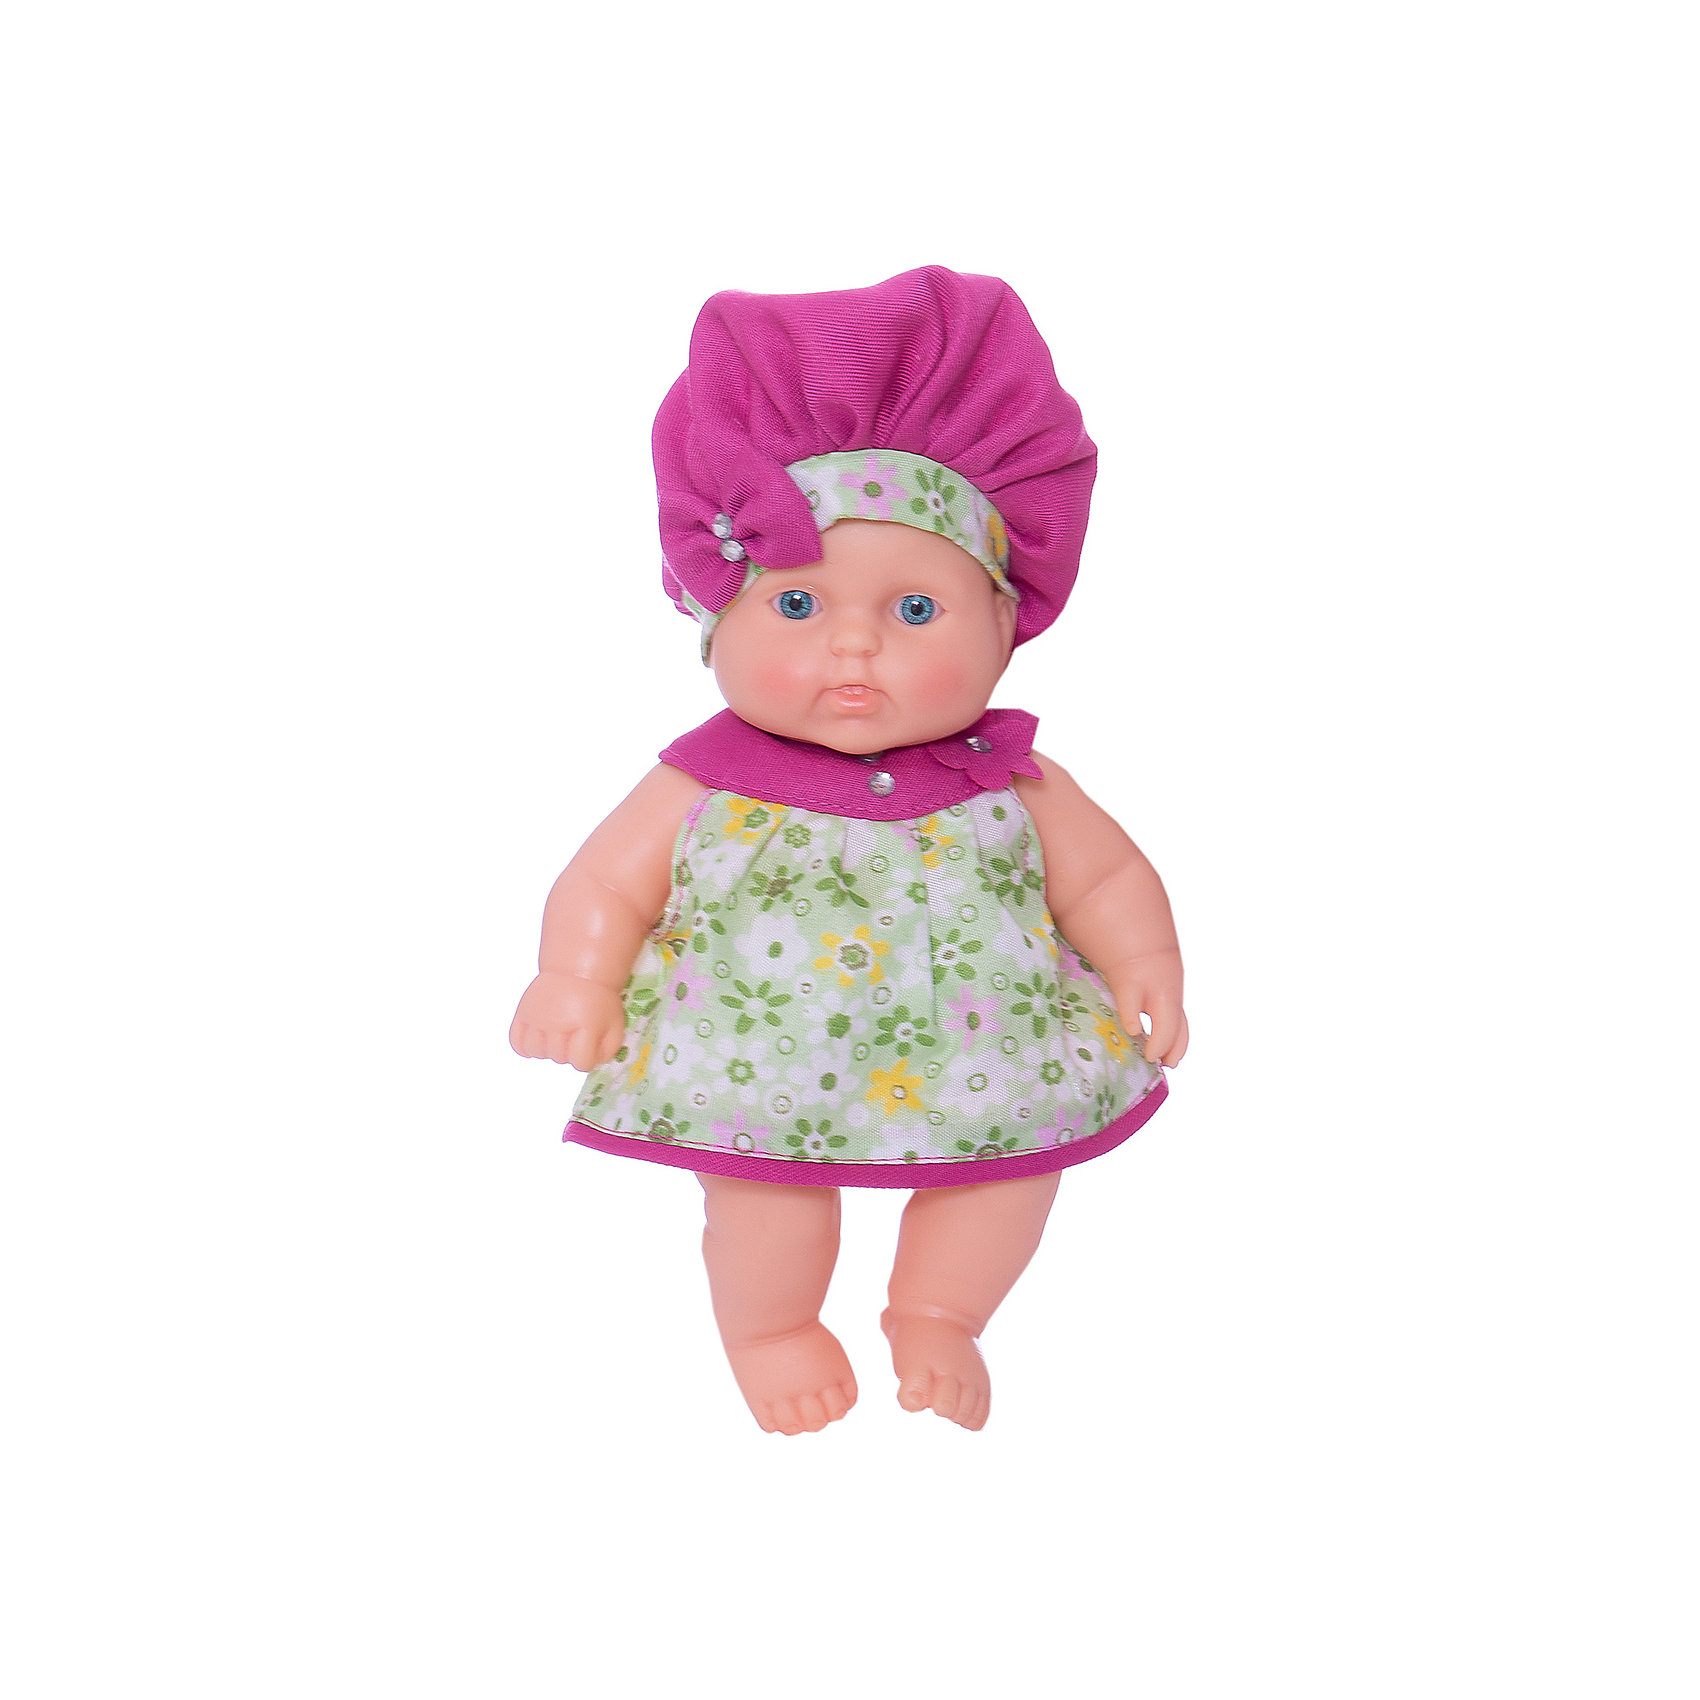 Весна Кукла Карапуз 13 (девочка), 20 см, Весна весна 35 см